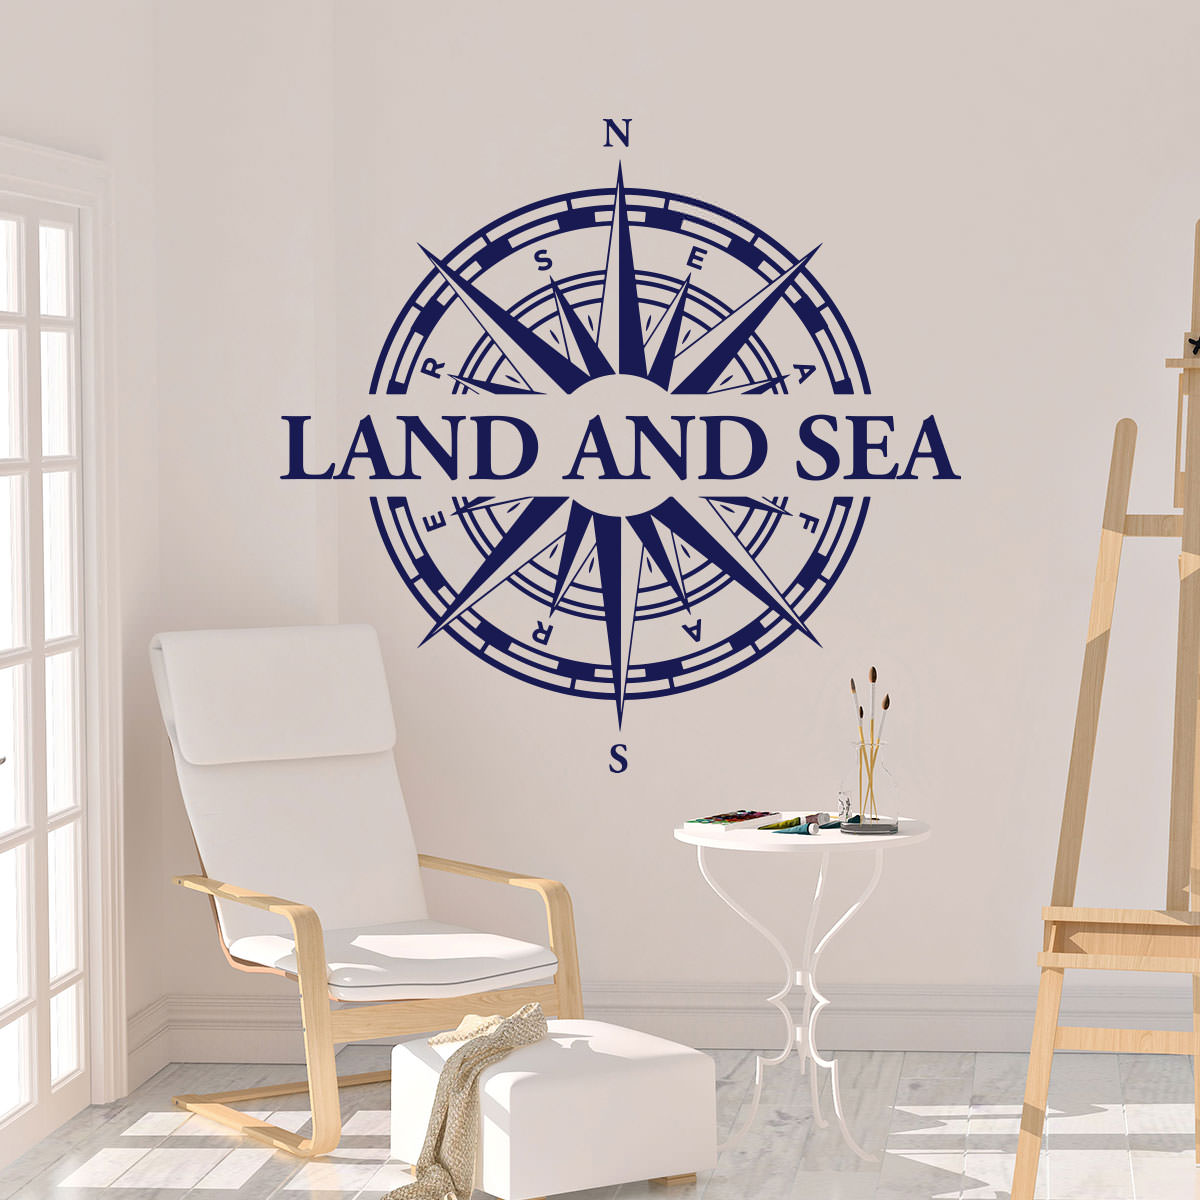 Wandtattoo maritim nautical kompass land and sea wandaufkleber wanddekoration wandmotiv - Wandtattoo maritim ...